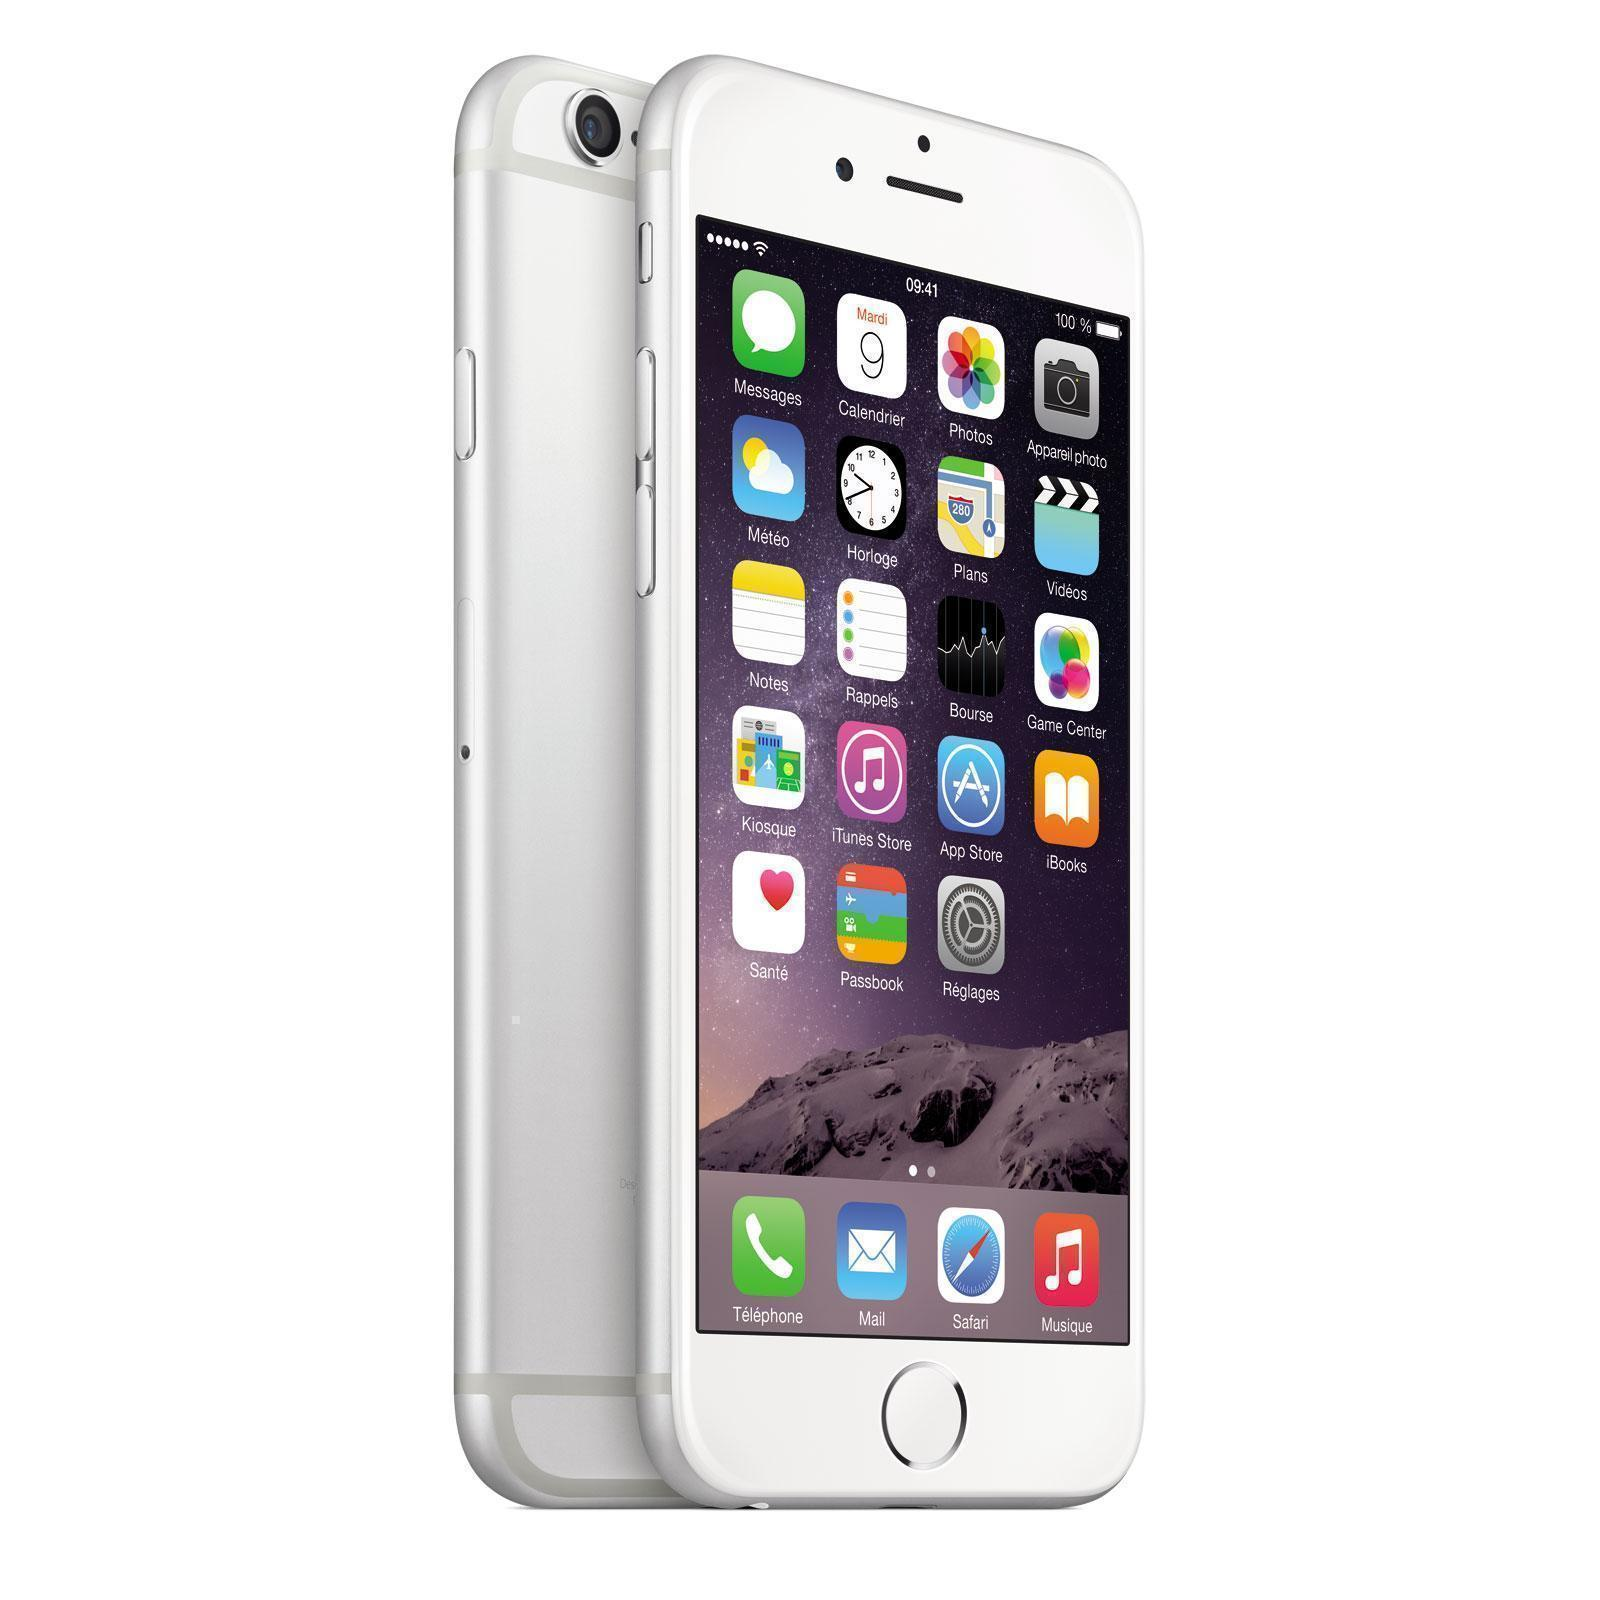 iPhone 6 128GB - Silber - Ohne Vertrag